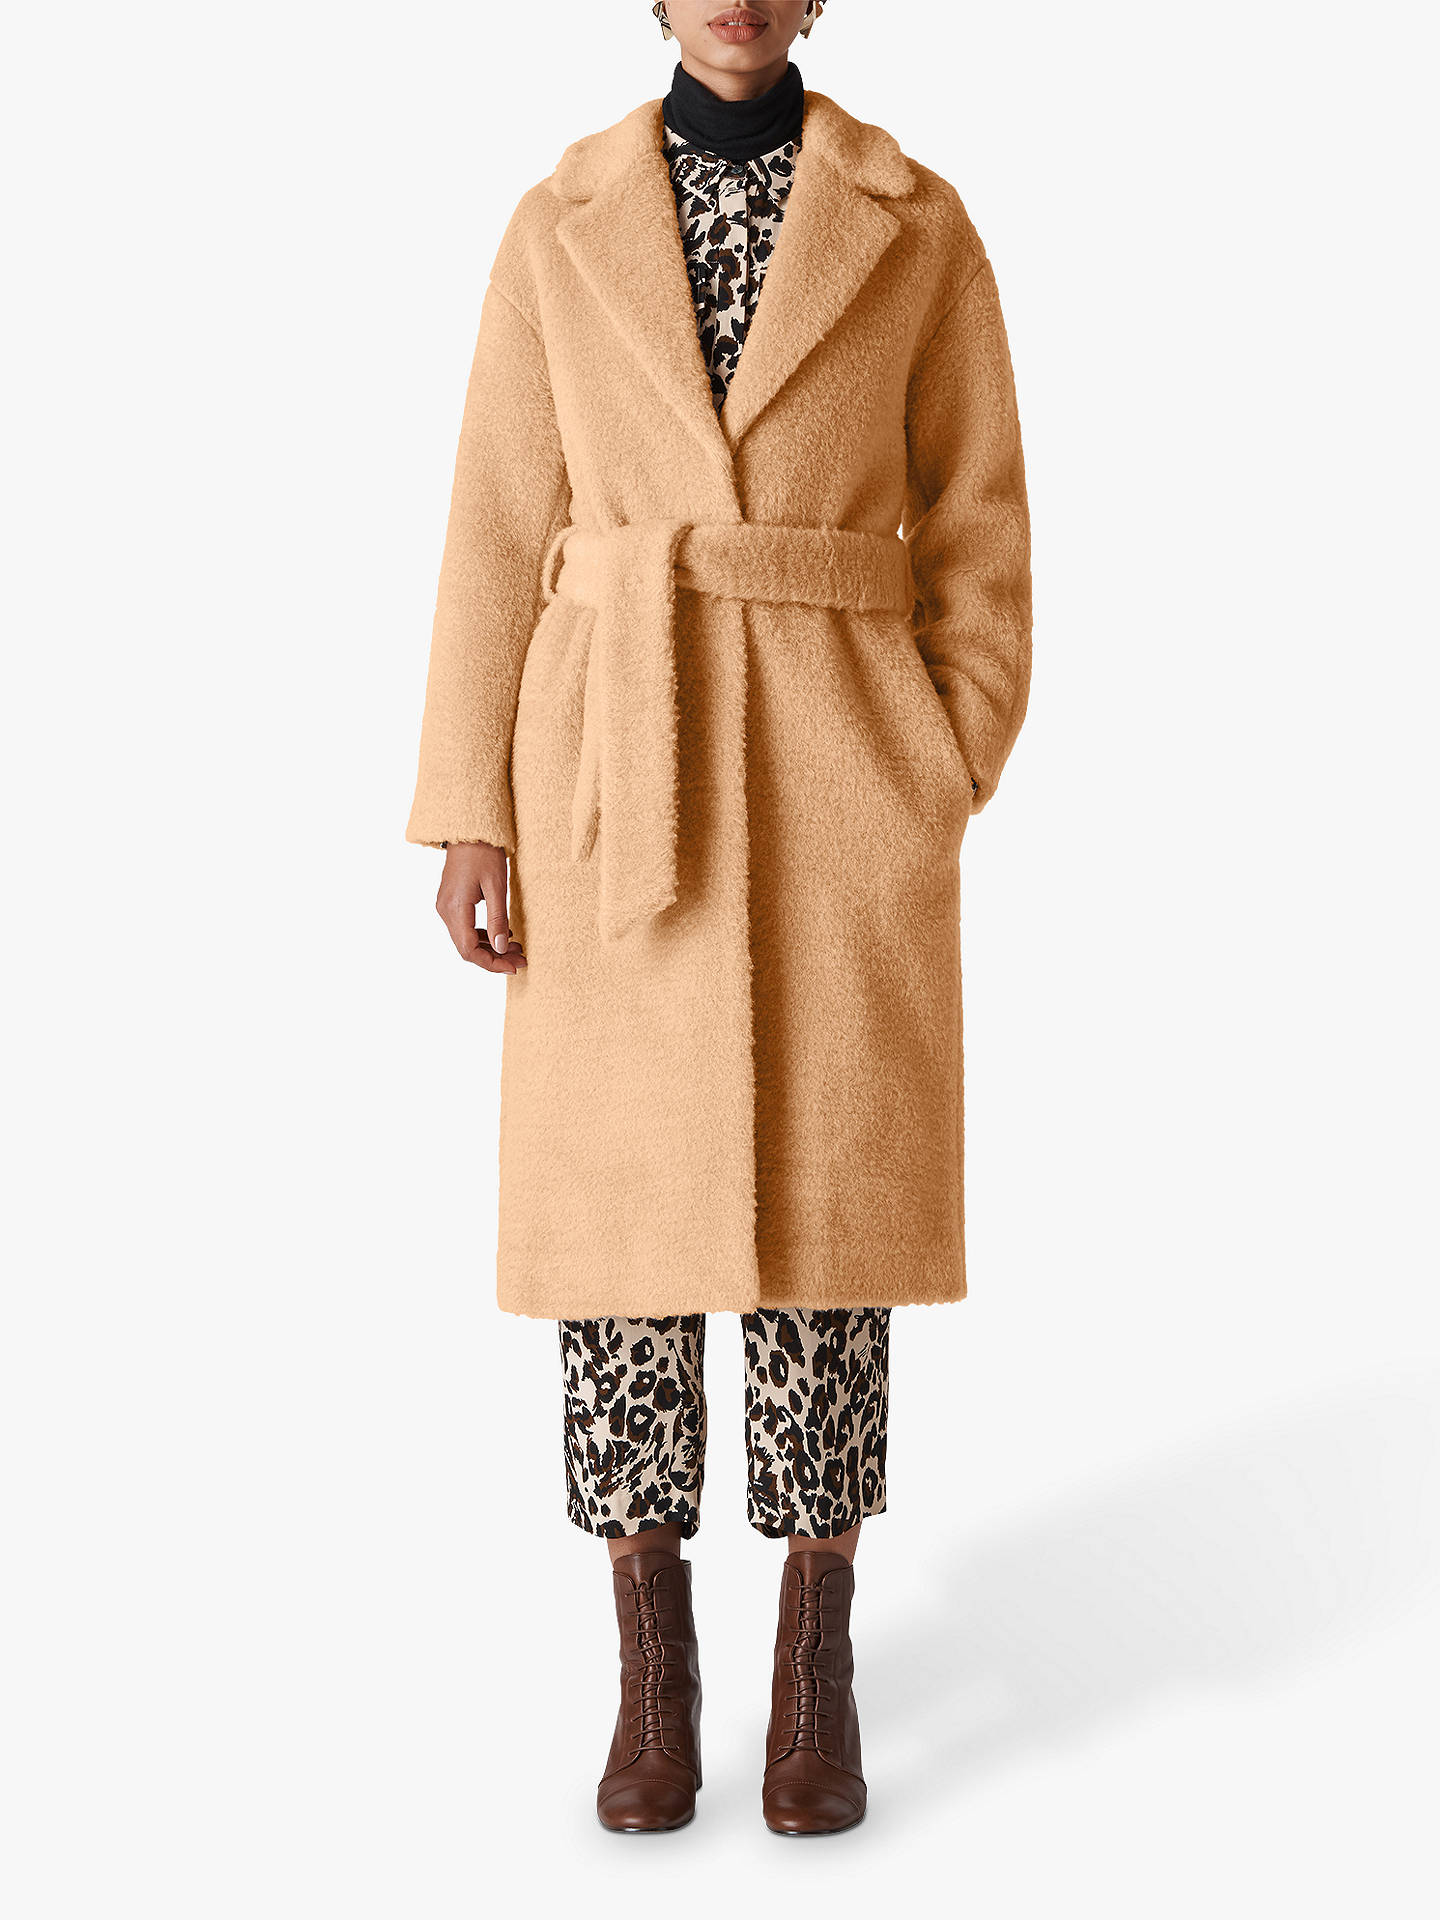 Whistles Textured Coat